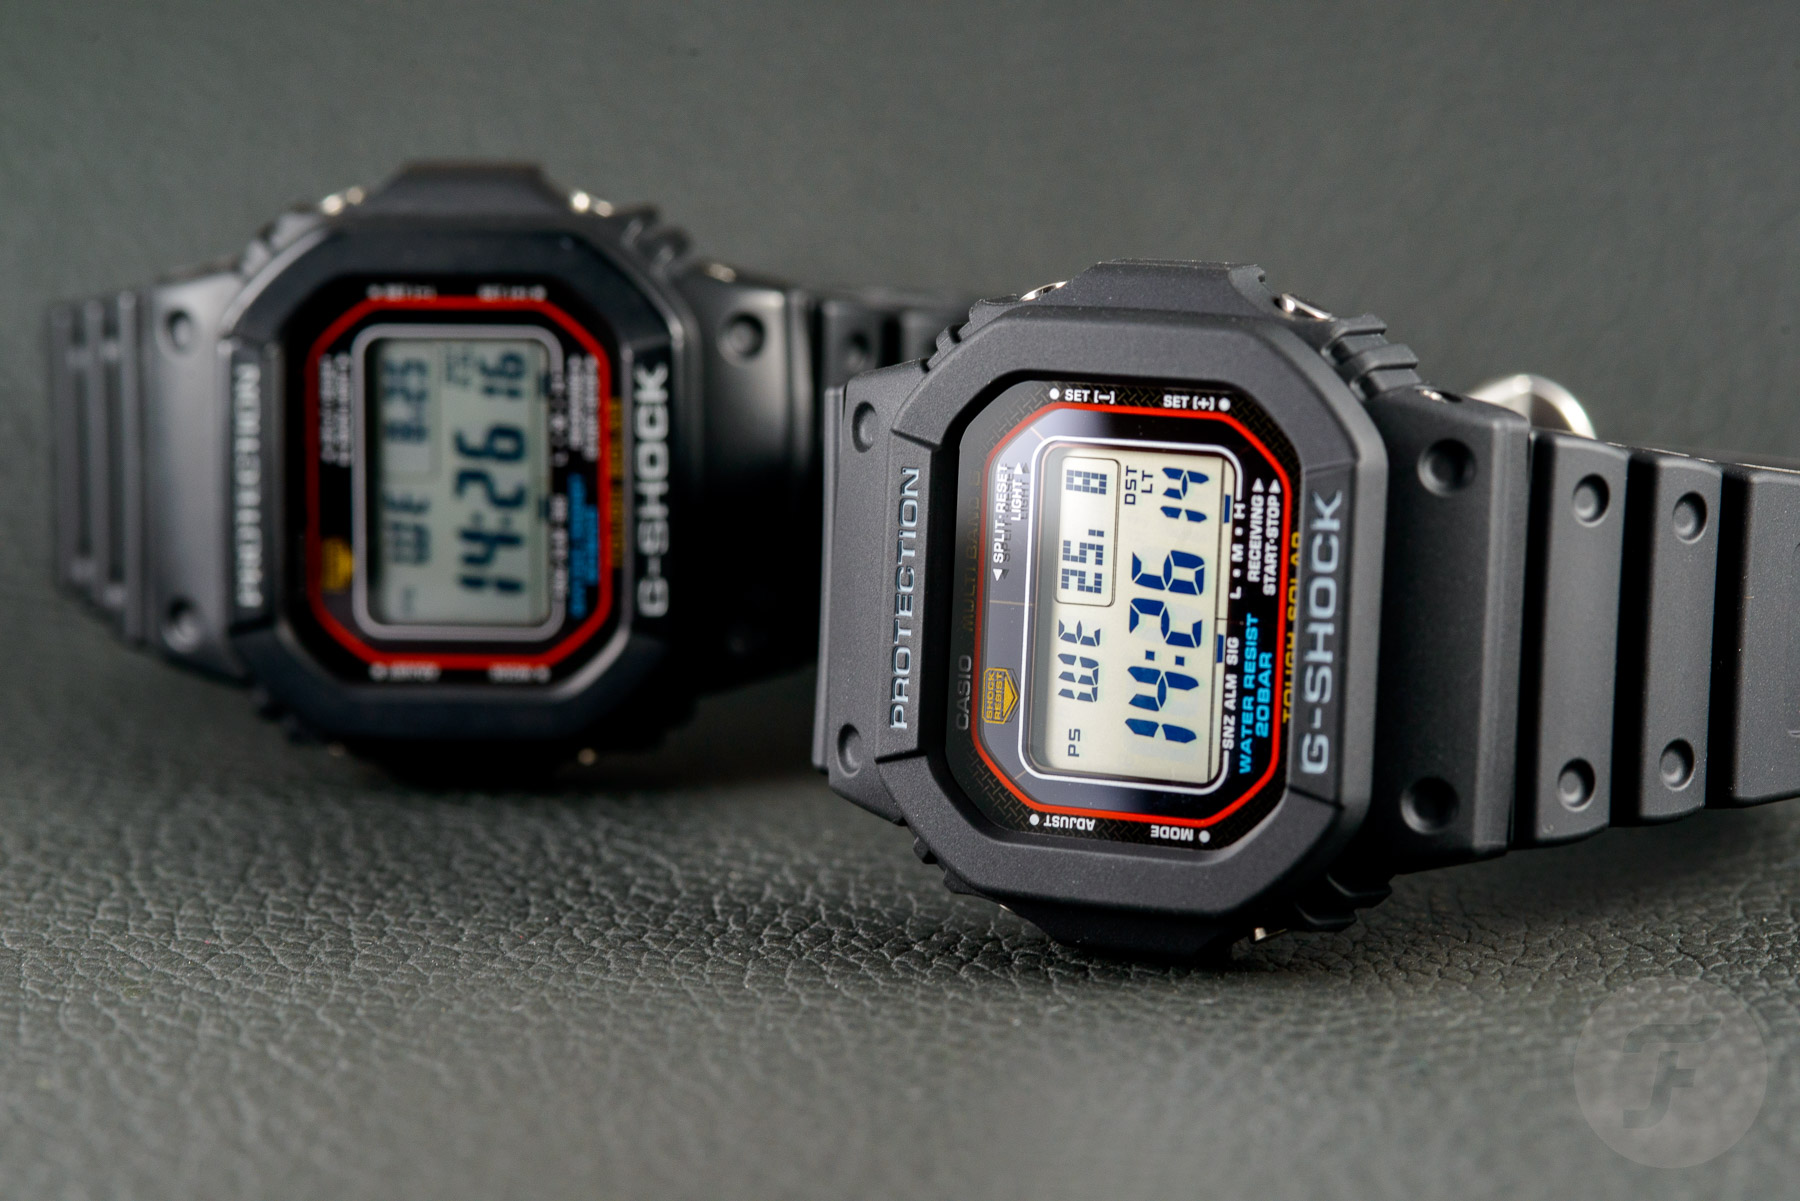 G-Shock GM-W5610 and U